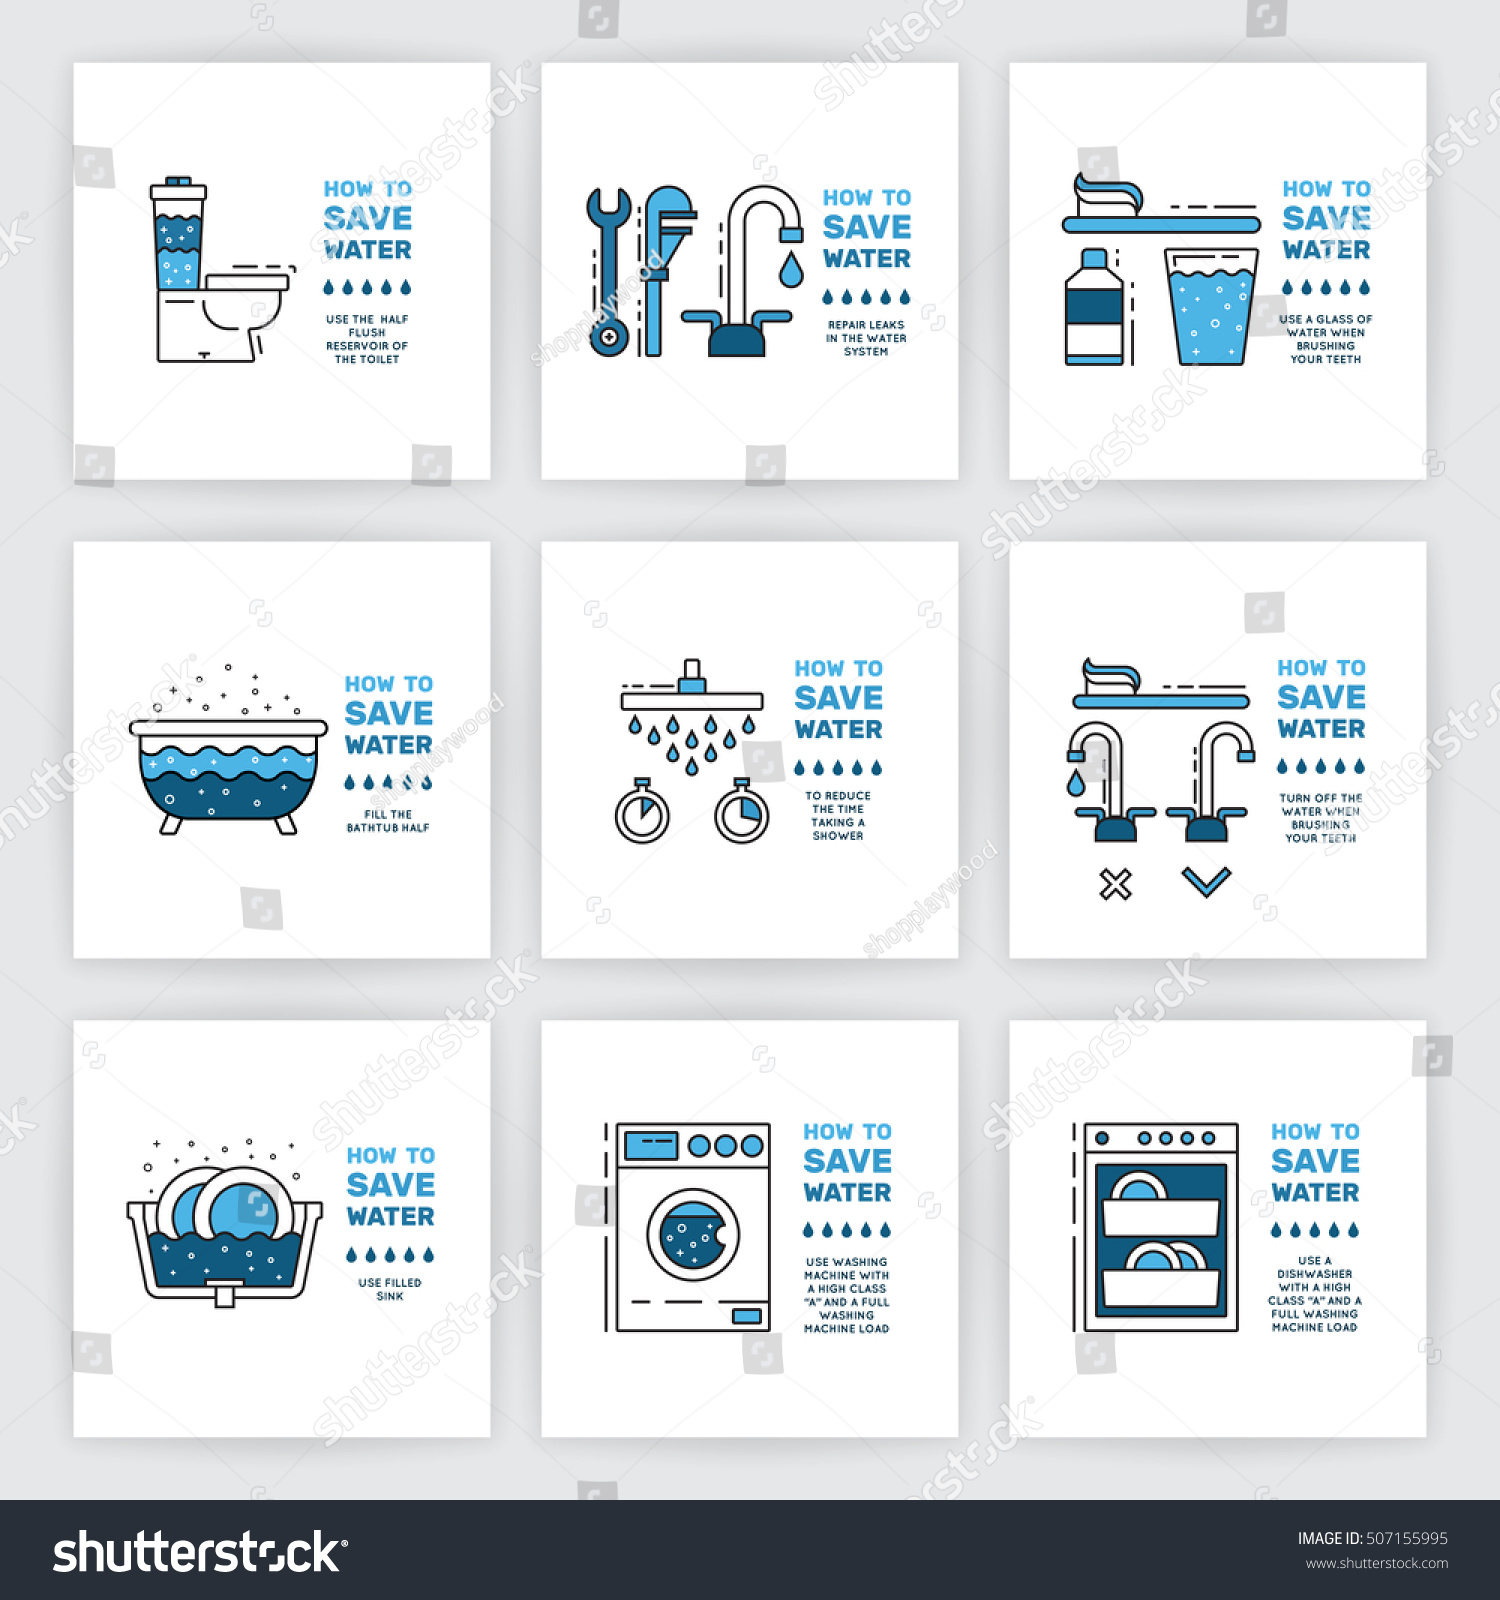 Illustration tips on saving water consumption stock vector